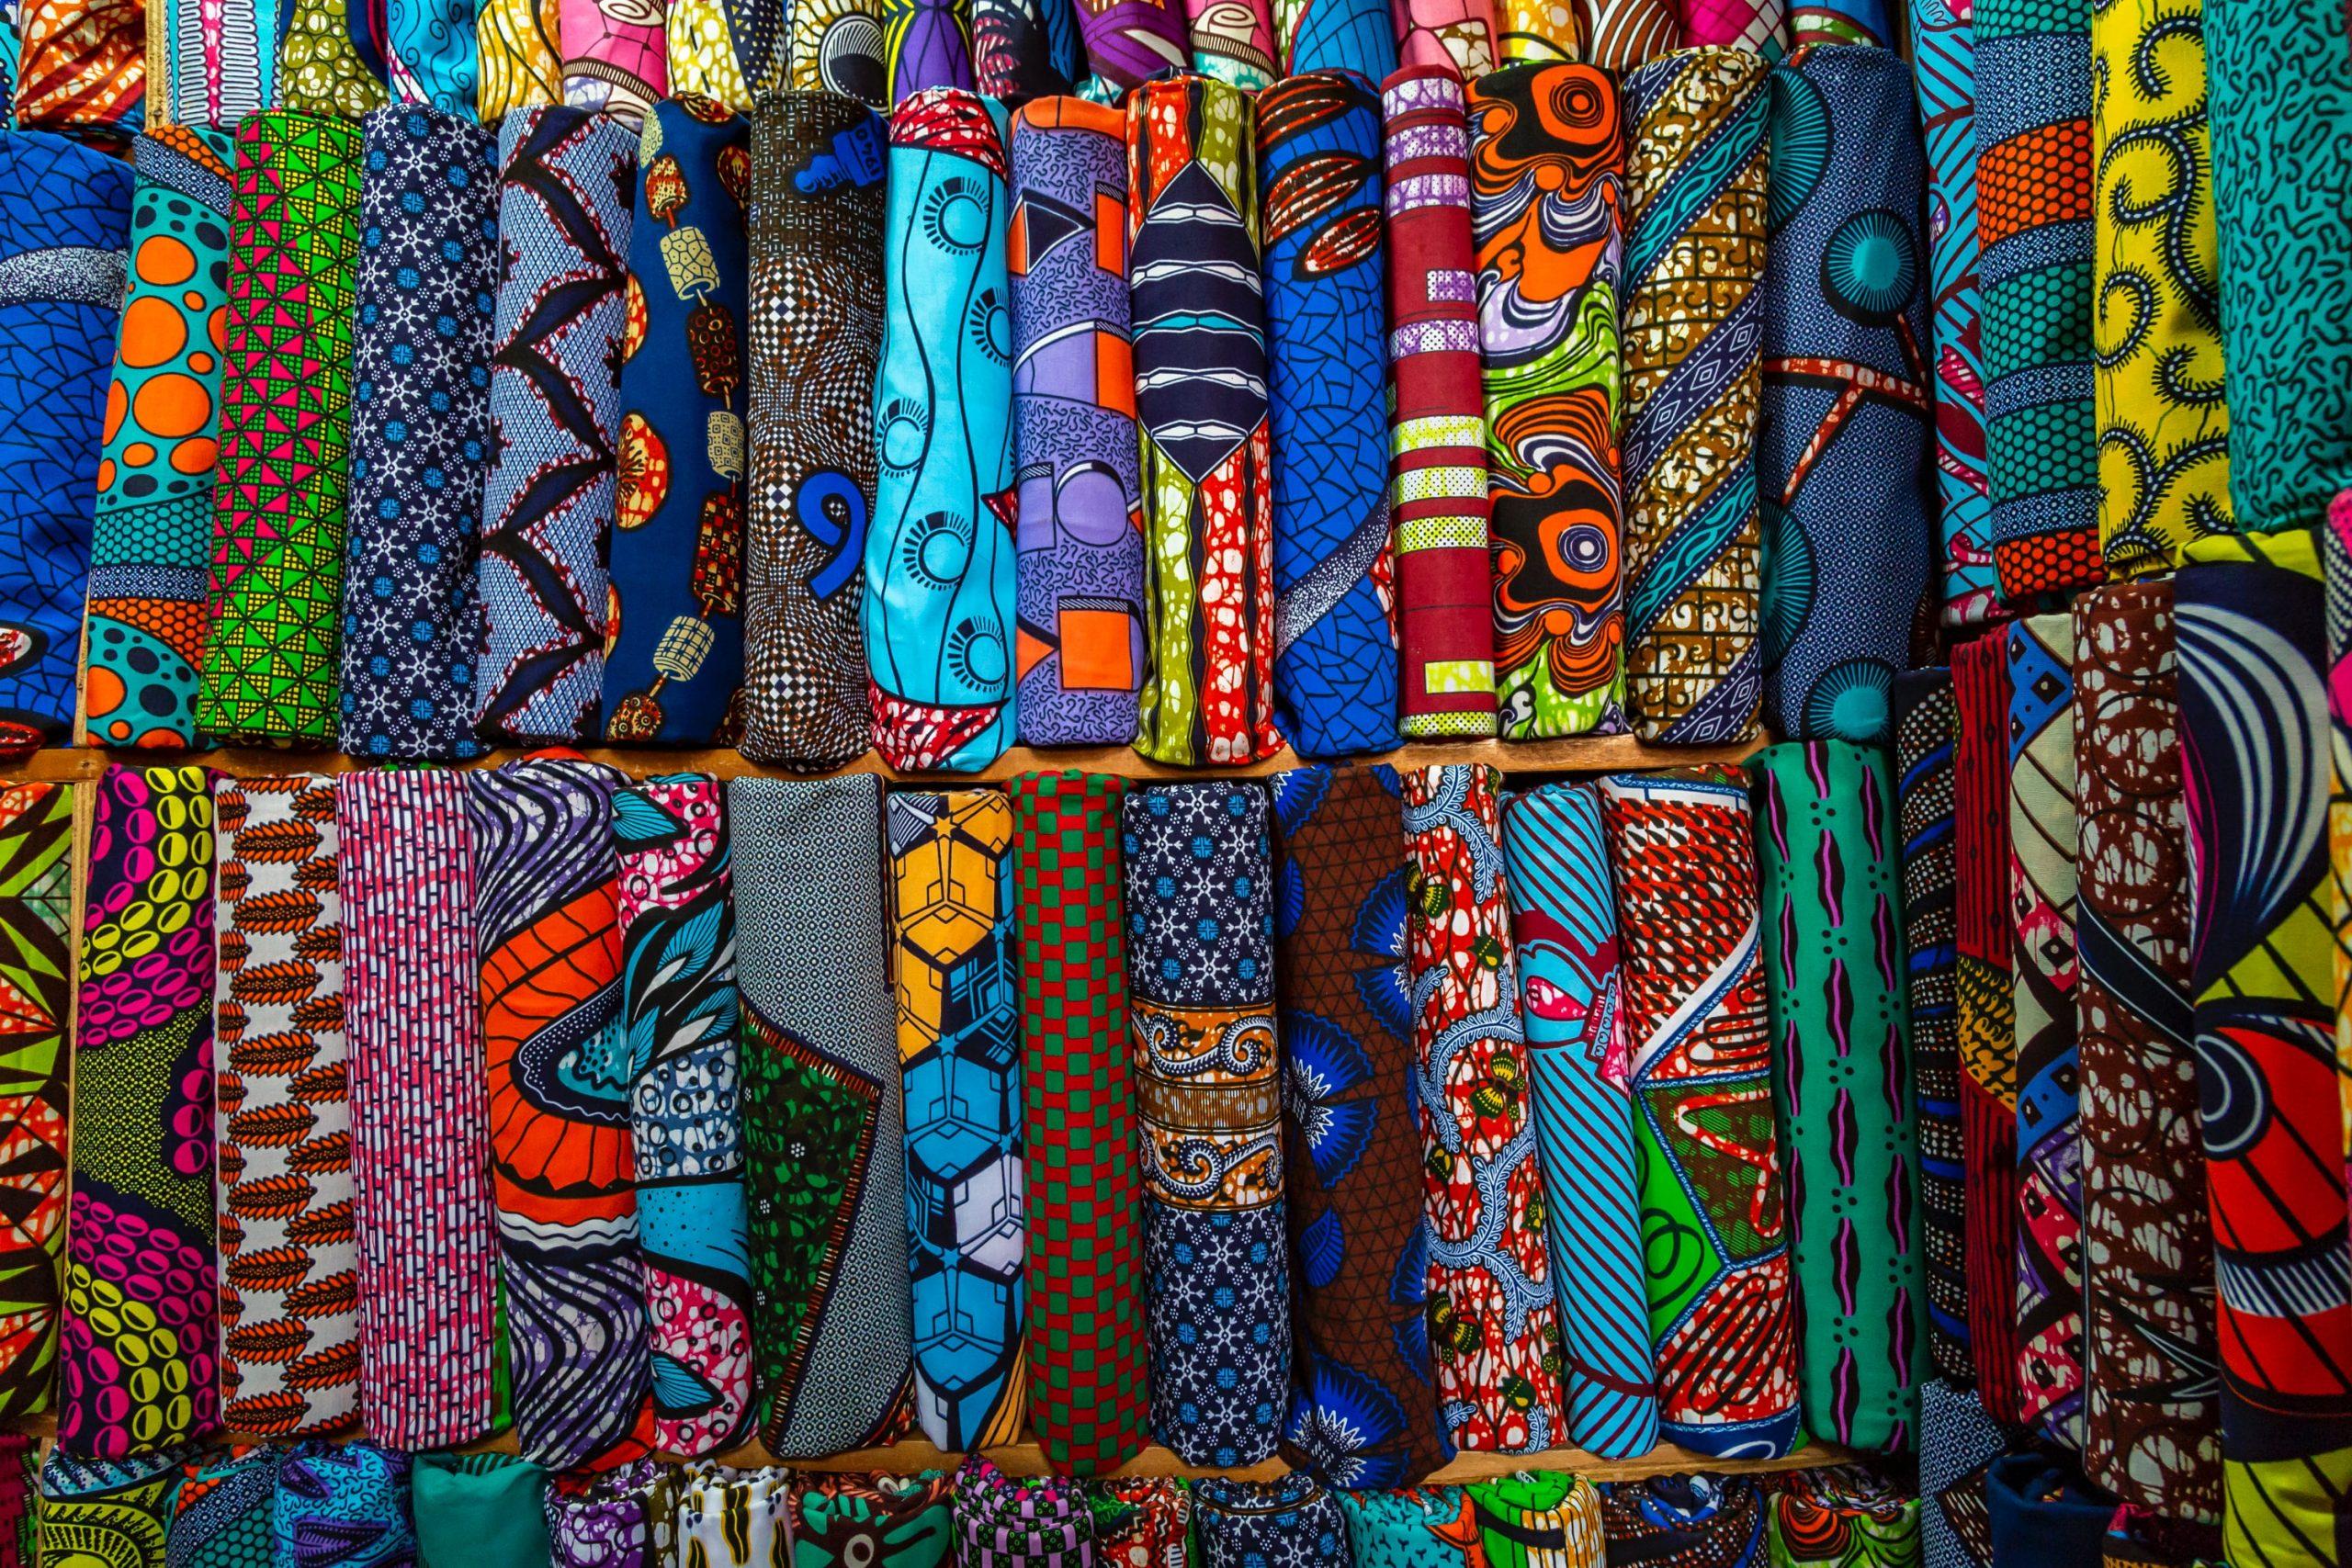 cores fortes na arquitetura africana